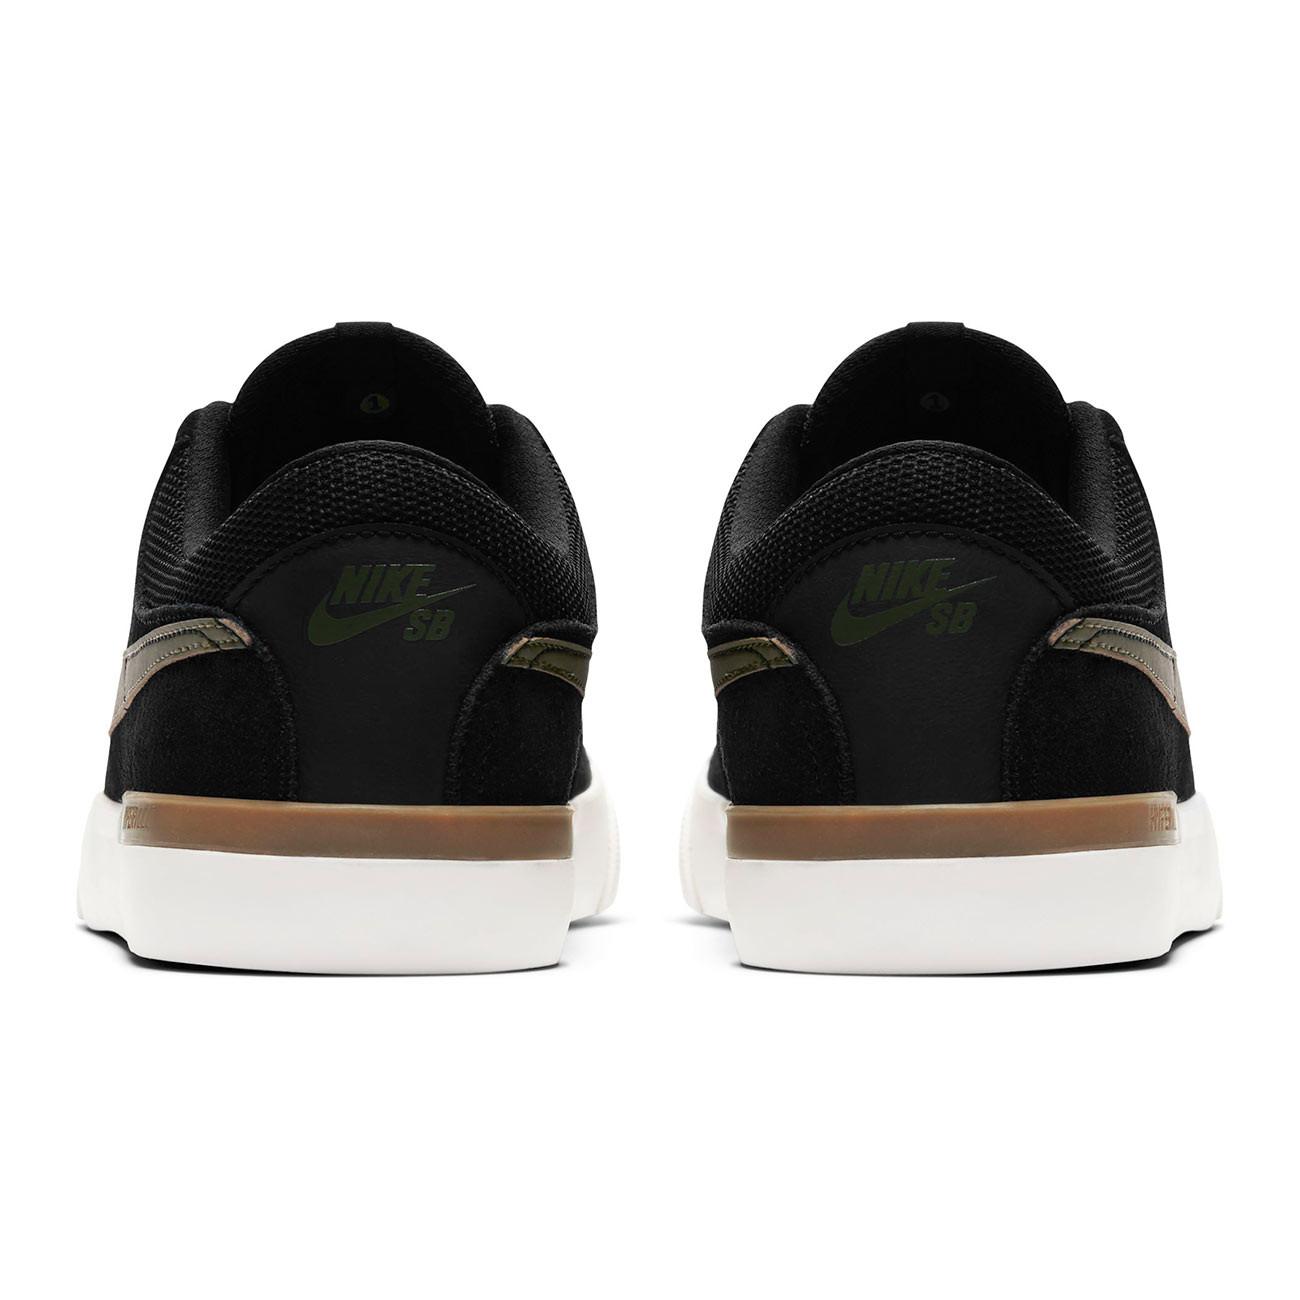 ee3e923e73b Sneakers Nike SB Hypervulc Eric Koston black medium olive-gum med ...